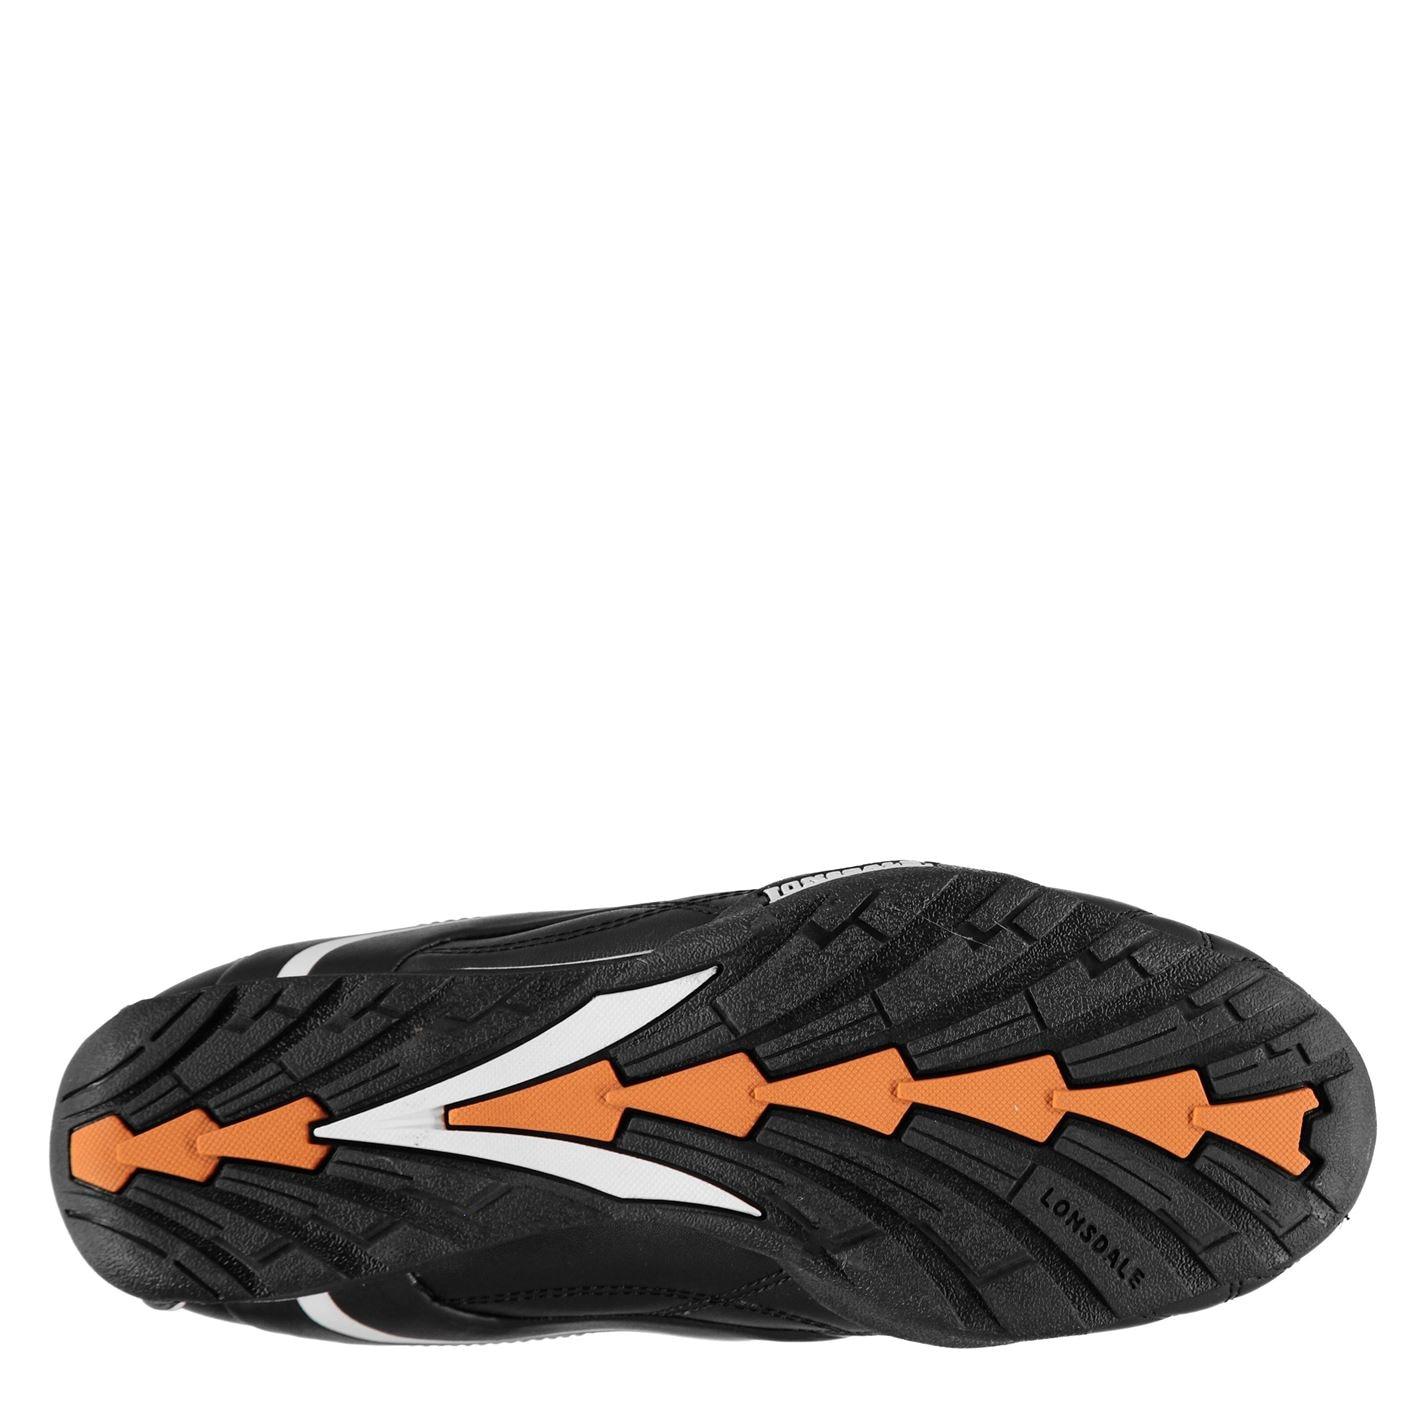 635e5d8a2 Pánske topánky | Lonsdale Camden Slip Mens Trainers Black/White ...